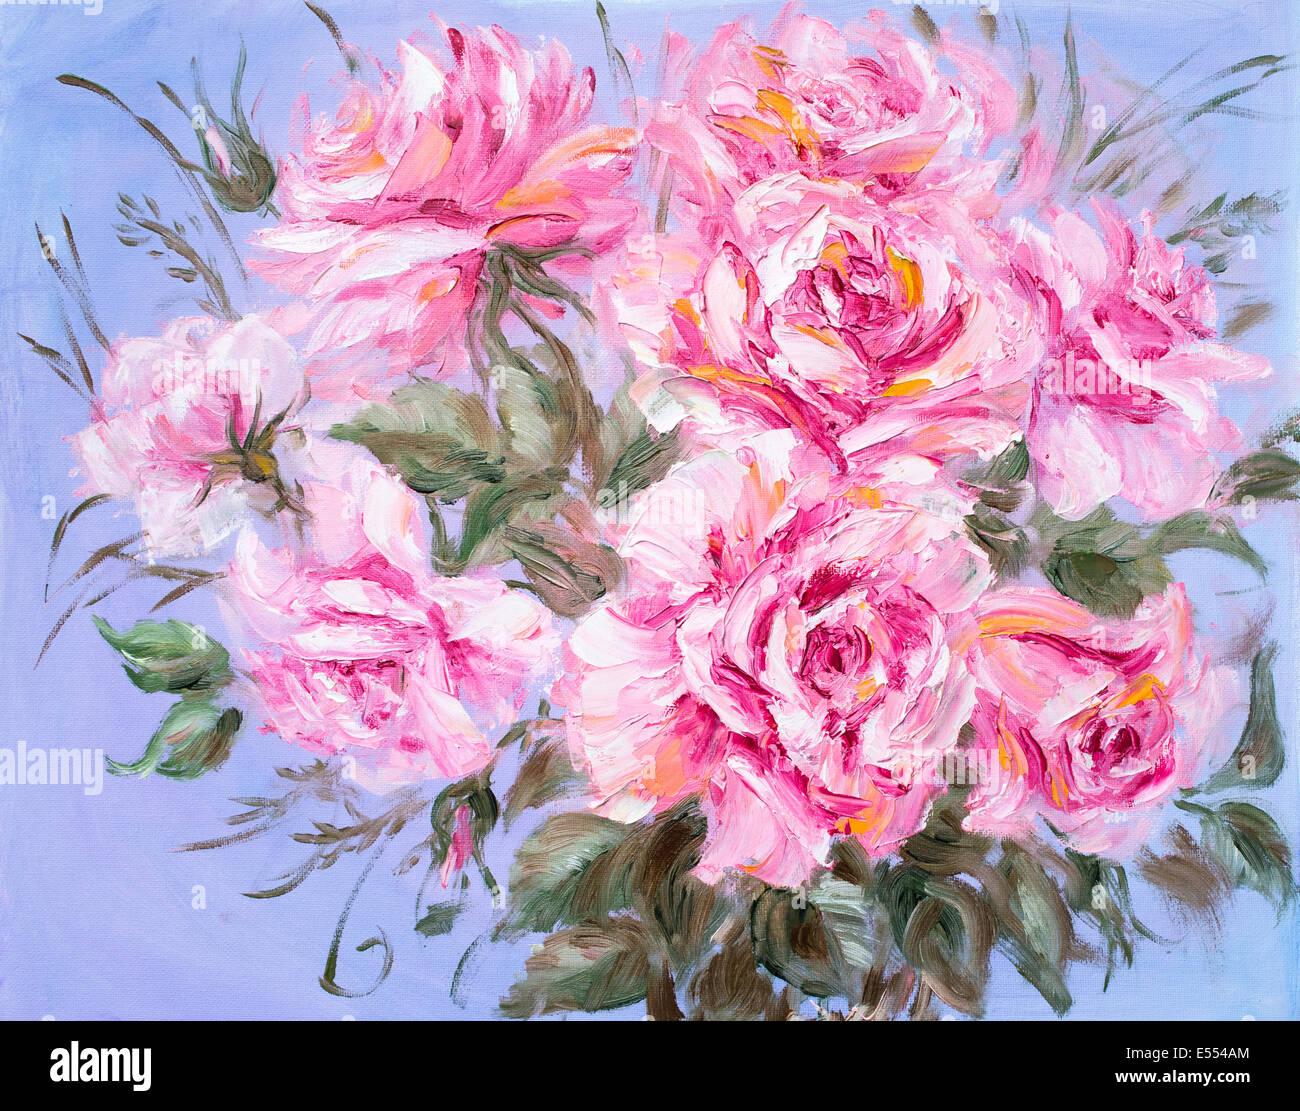 Bellissime Rose, pittura ad olio su tela di canapa Immagini Stock